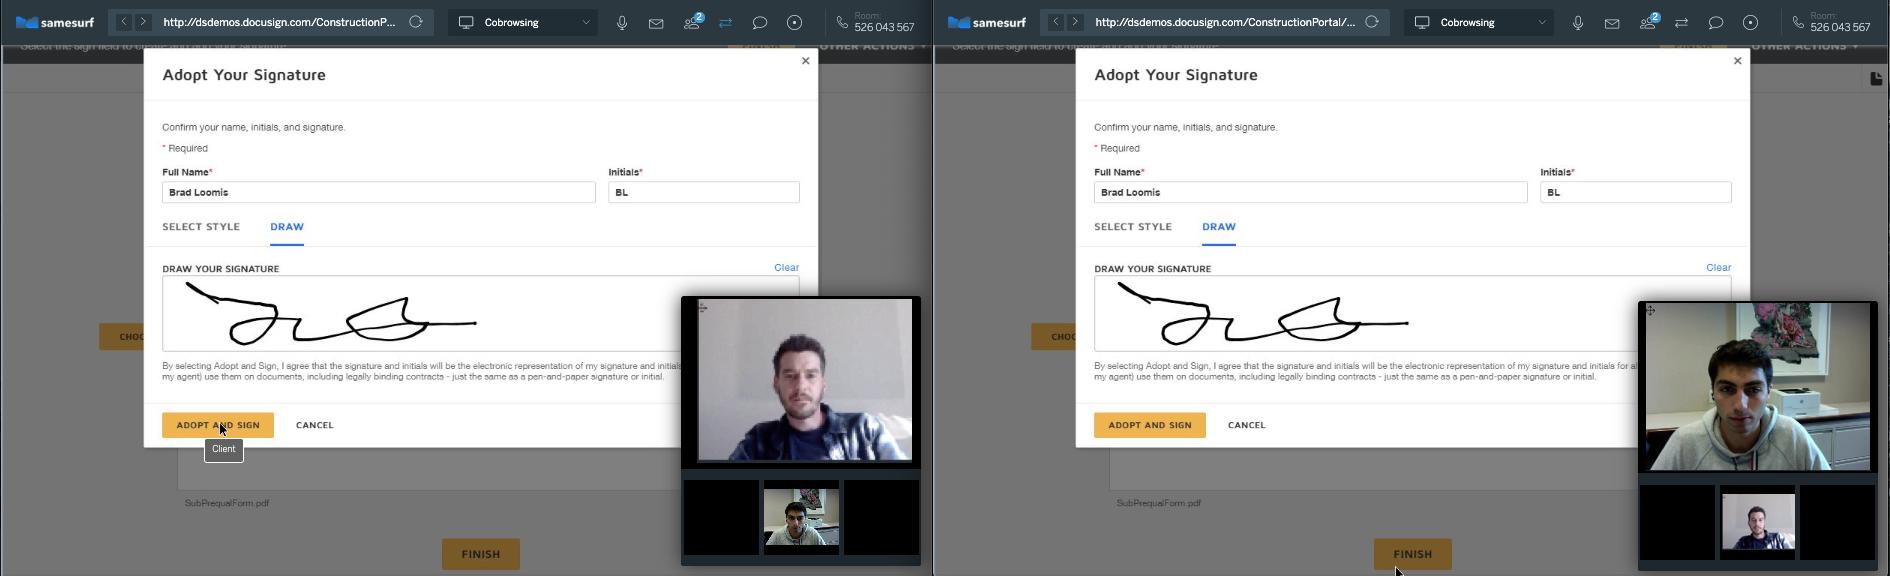 Samesurf Digital Signature